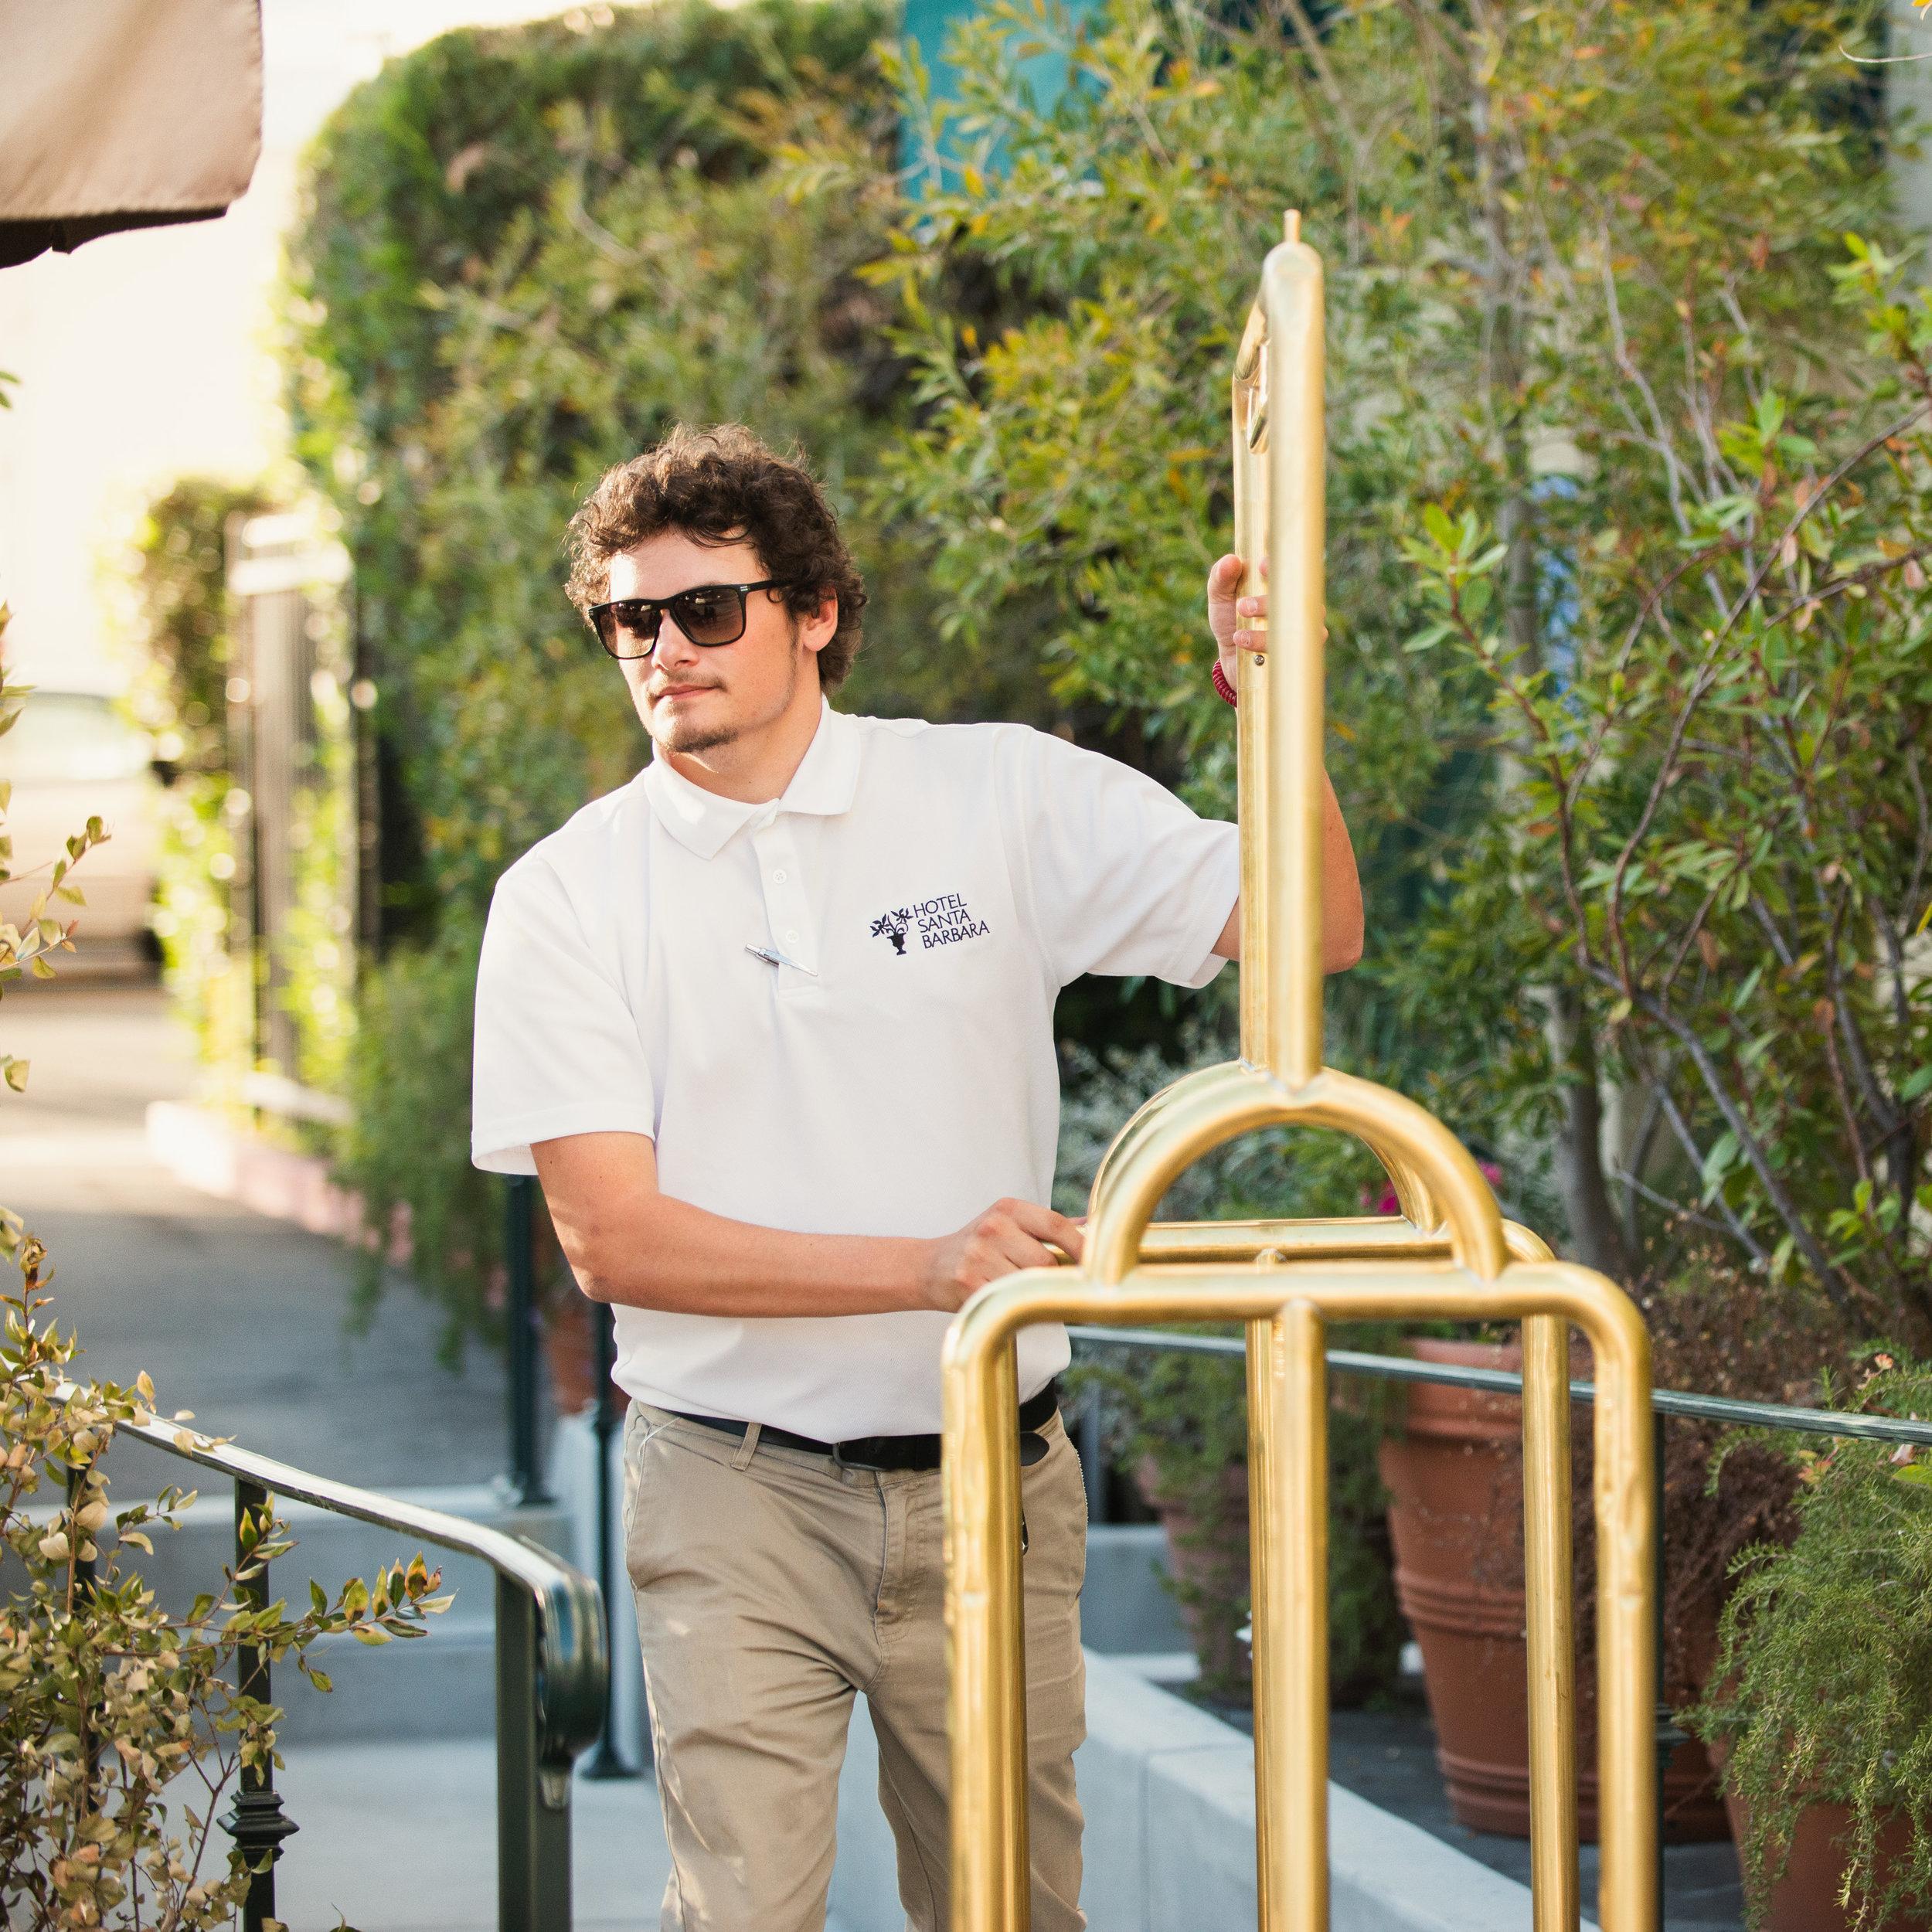 California-Hotel-Hospitality-Photographer-7273.jpg